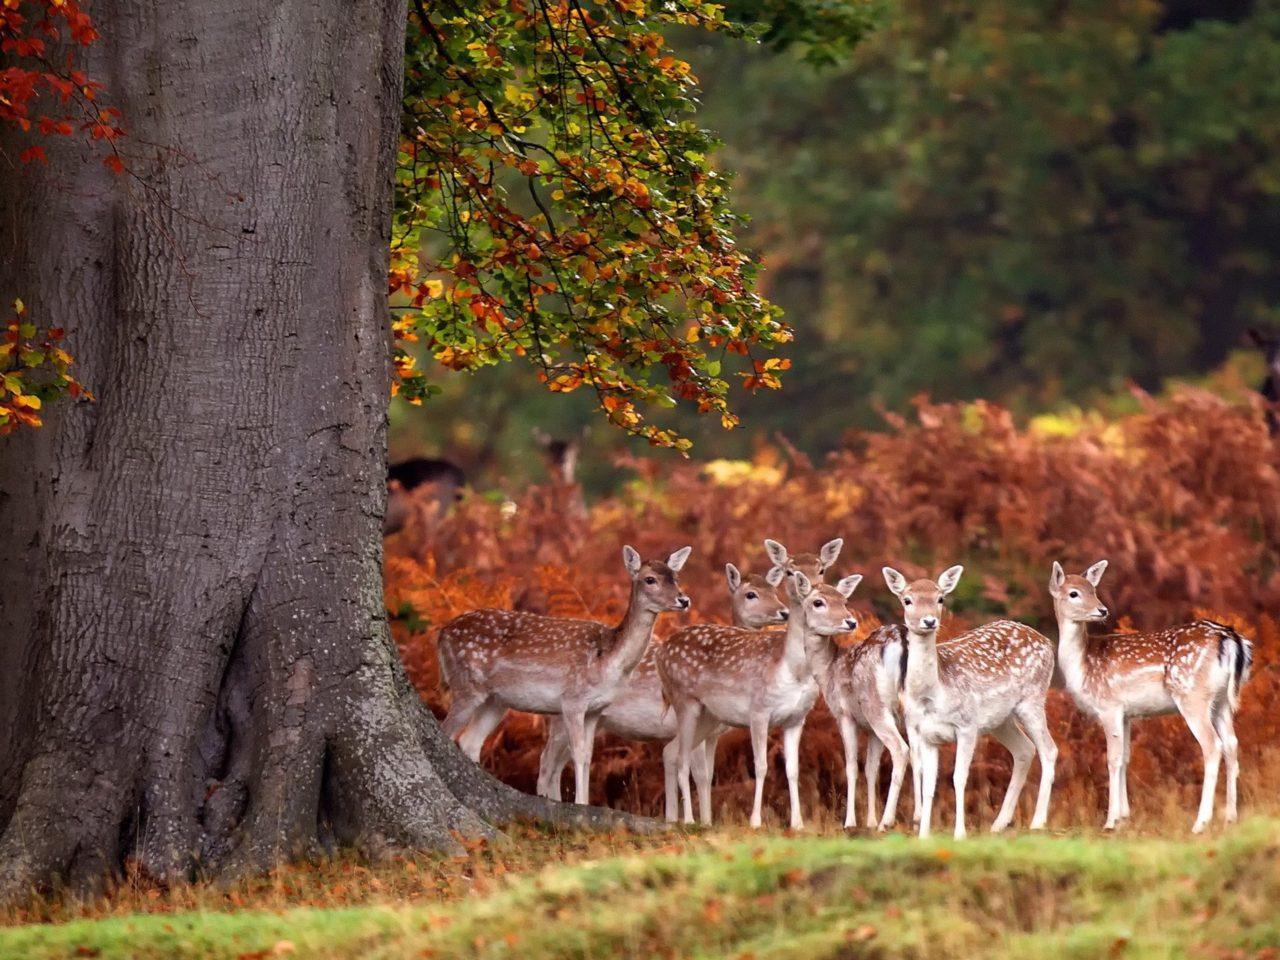 Fall With Water Wallpaper Hd Deer Herd Autumn Forest Grass Trees 3840x2400